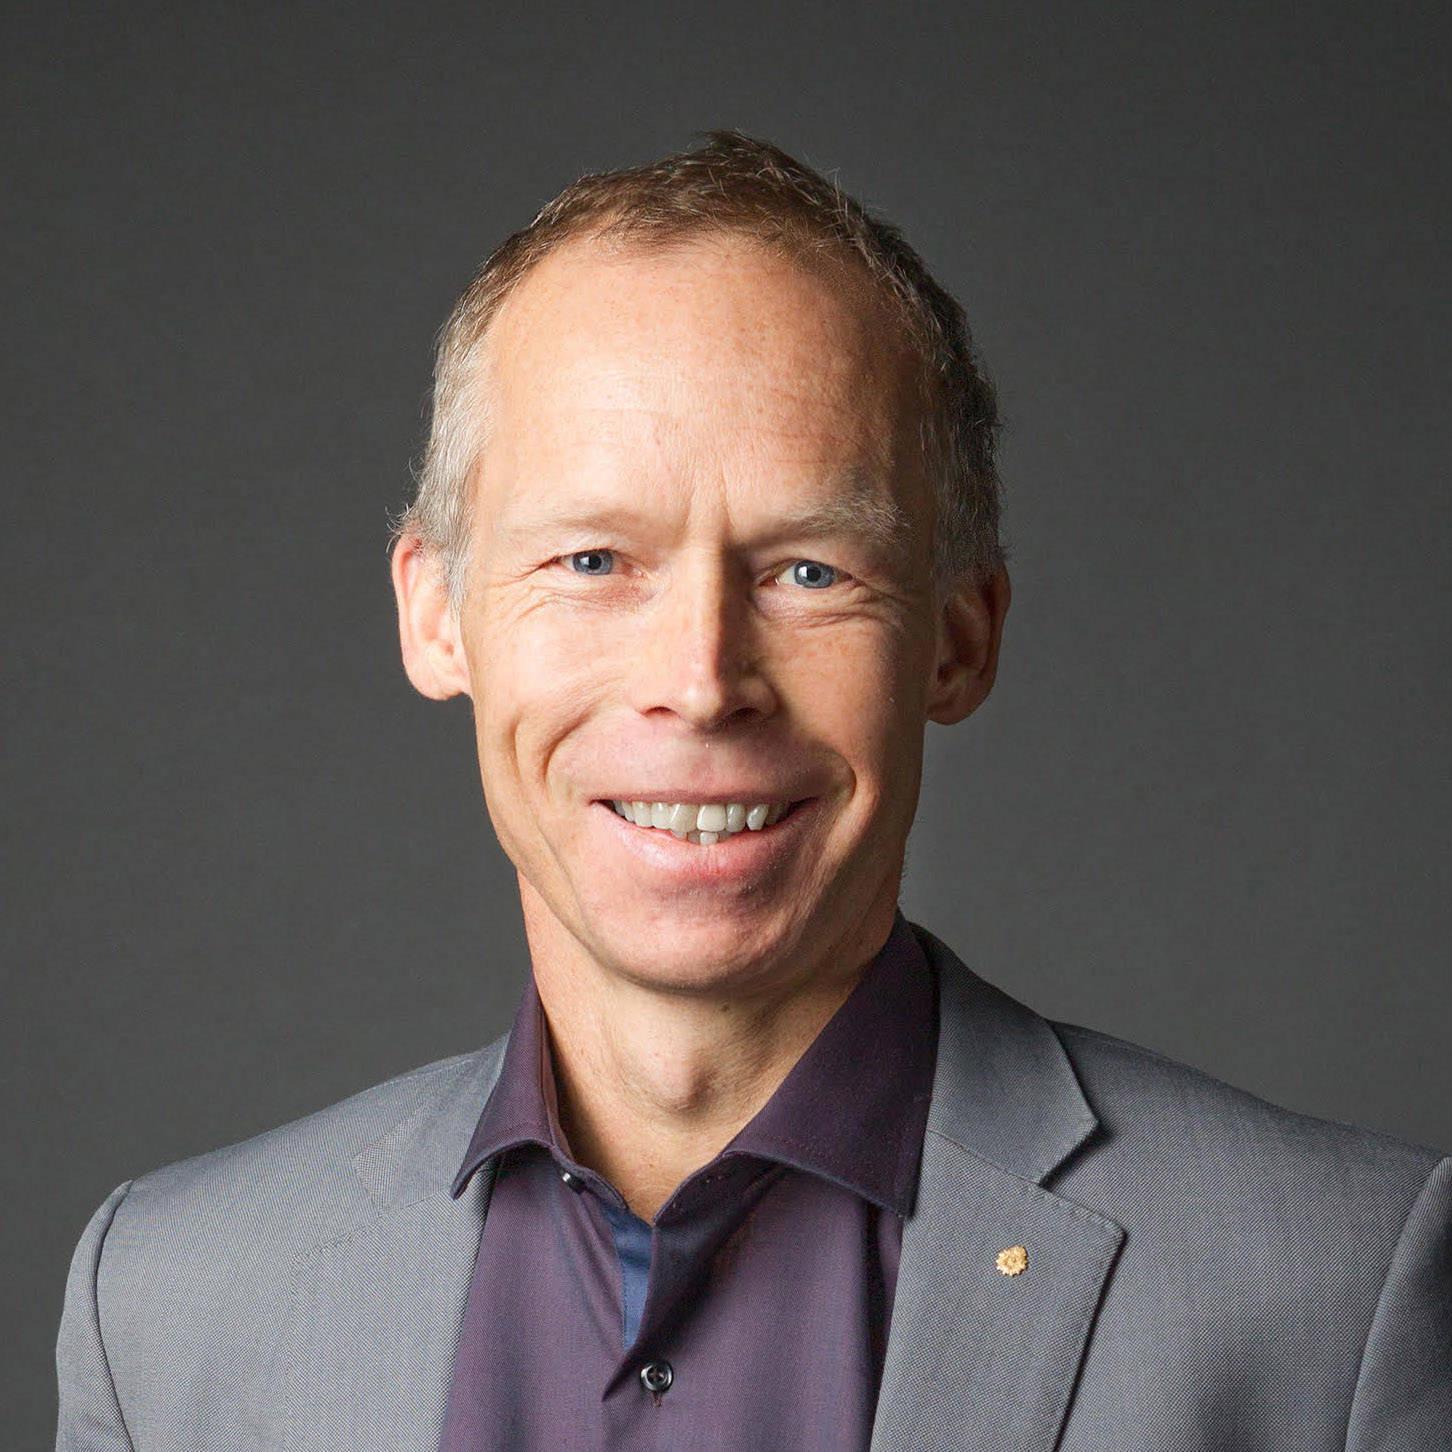 Photo of Johan Rockström